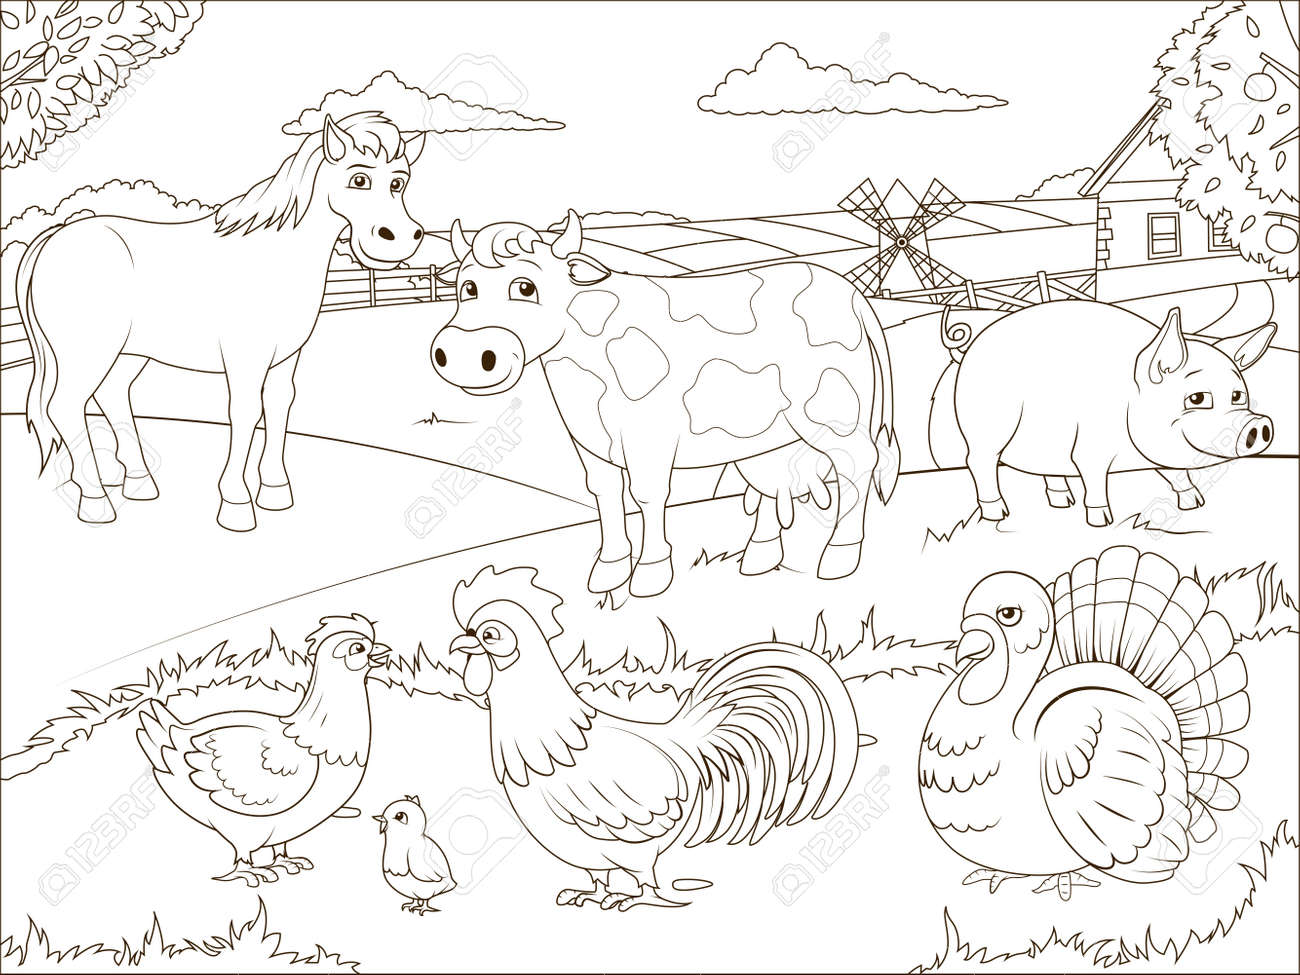 Coloriage Batiment Ferme.Livre De Coloriage Dessin Anime Ferme Jeu Educatif Illustration